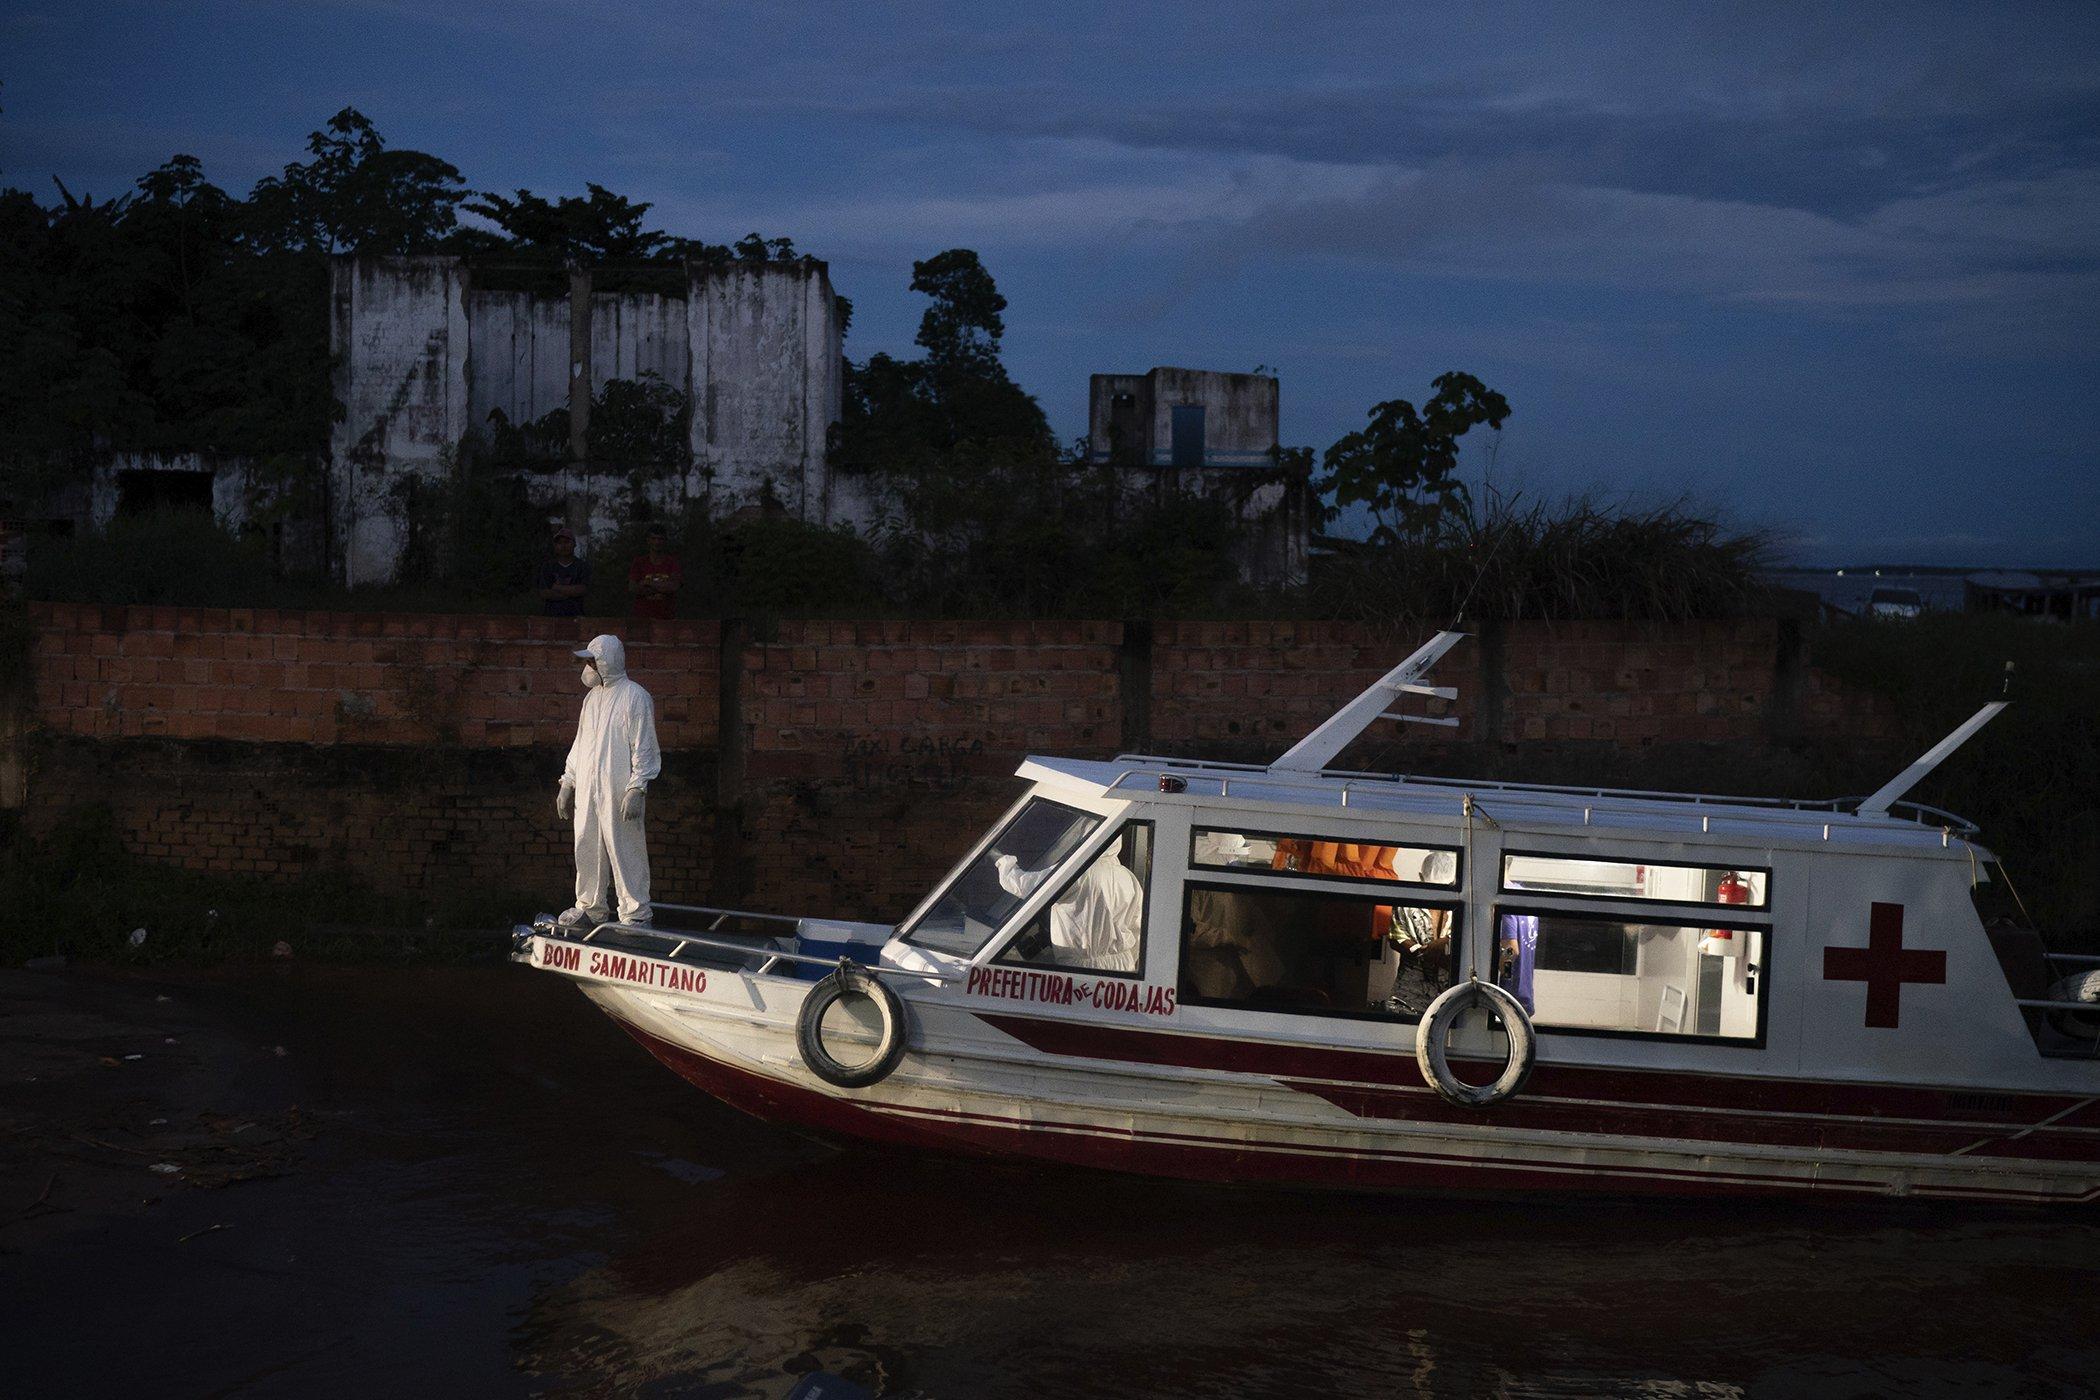 amazon-boat.jpg